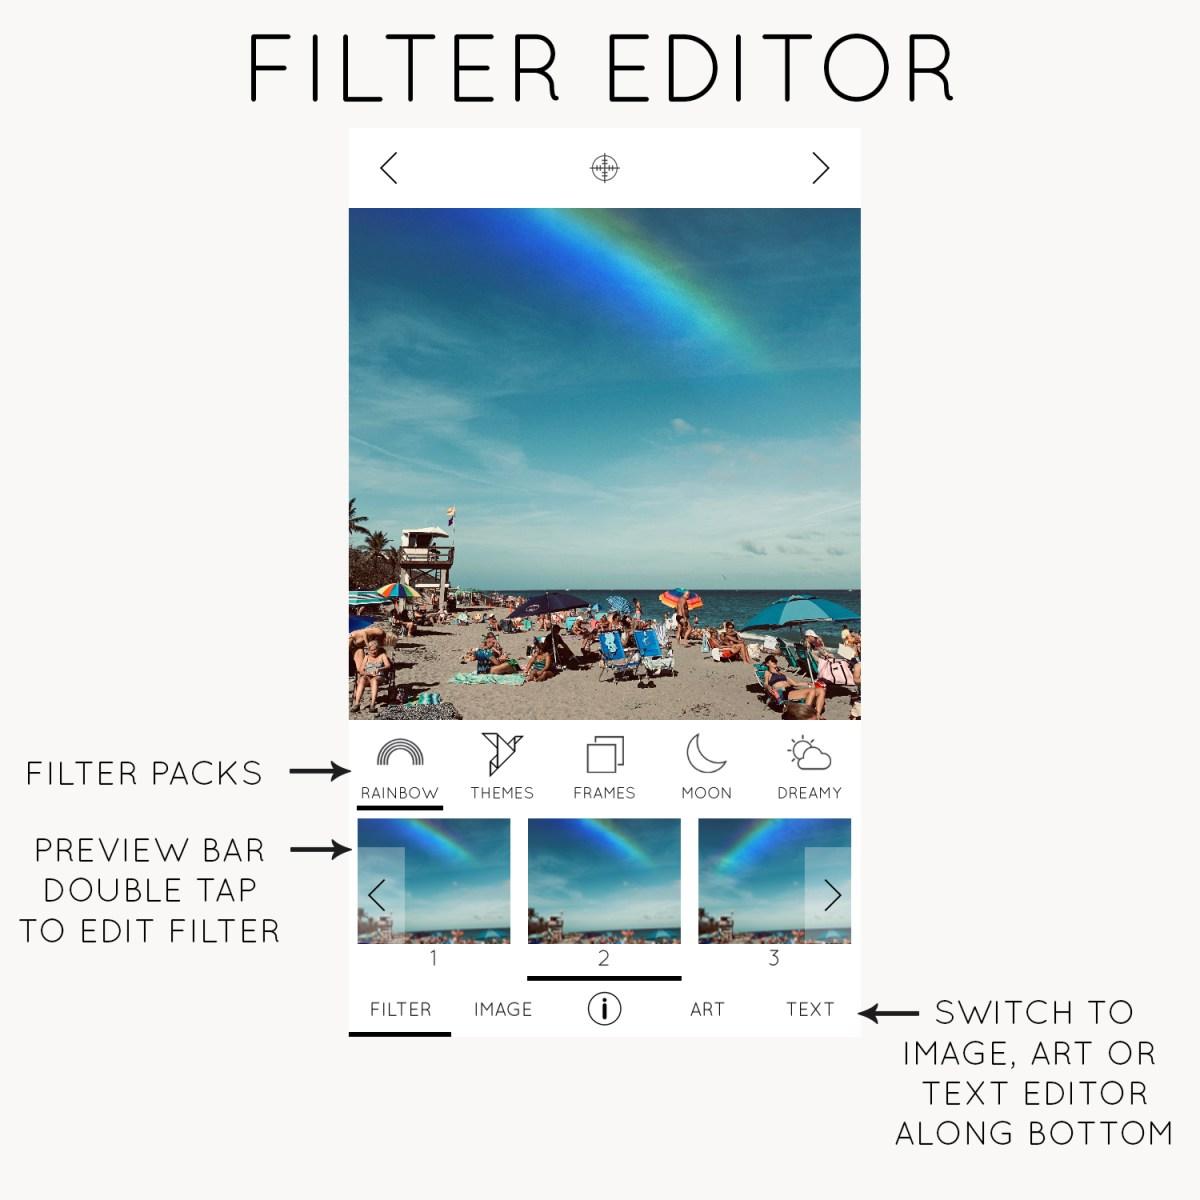 filter-editor-guide1